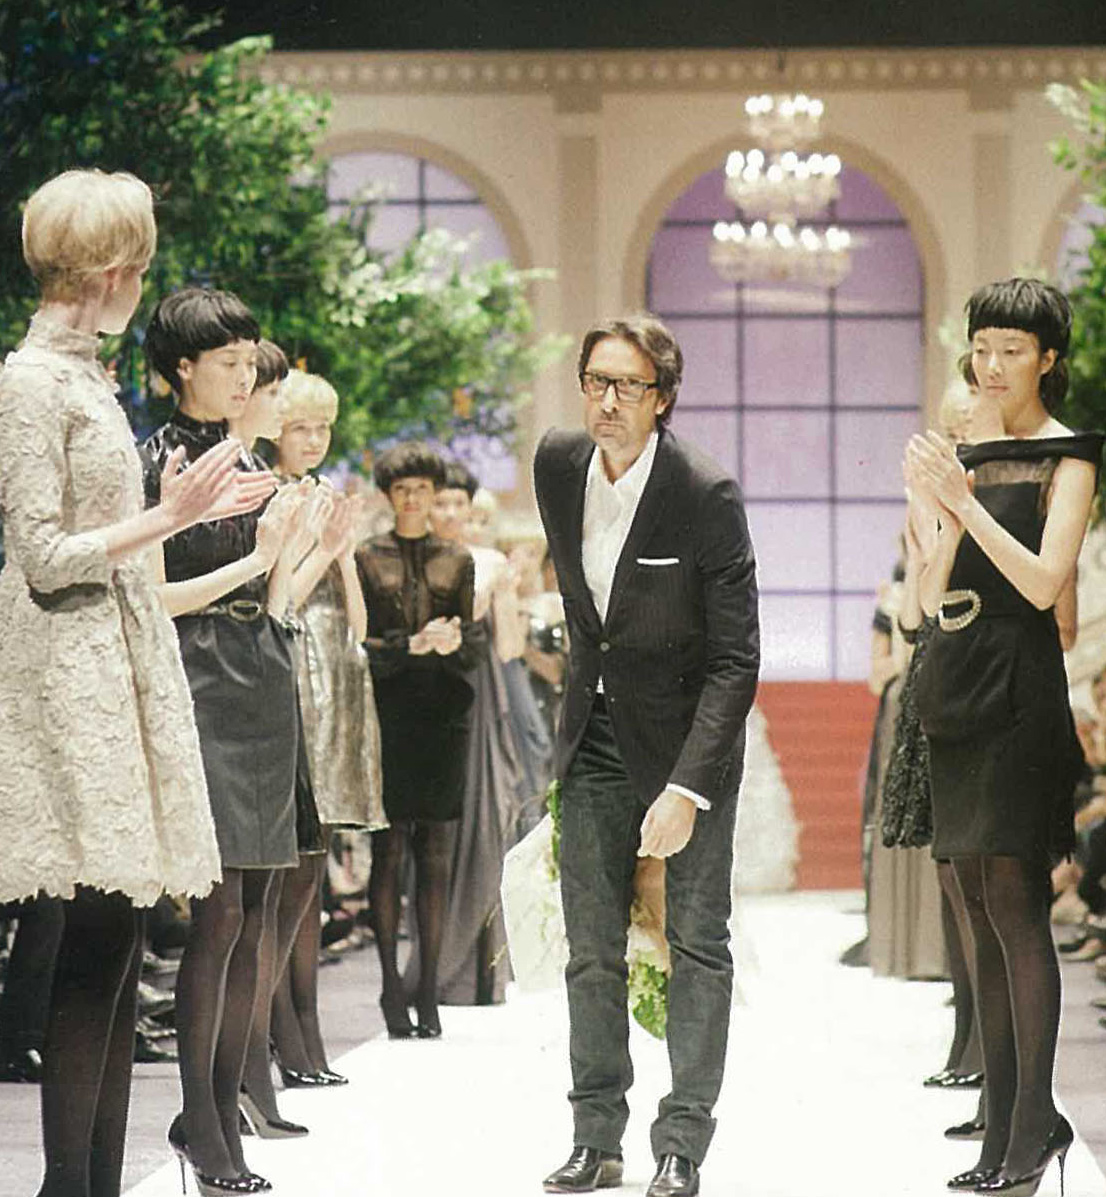 (Français) Couture – Partie 2